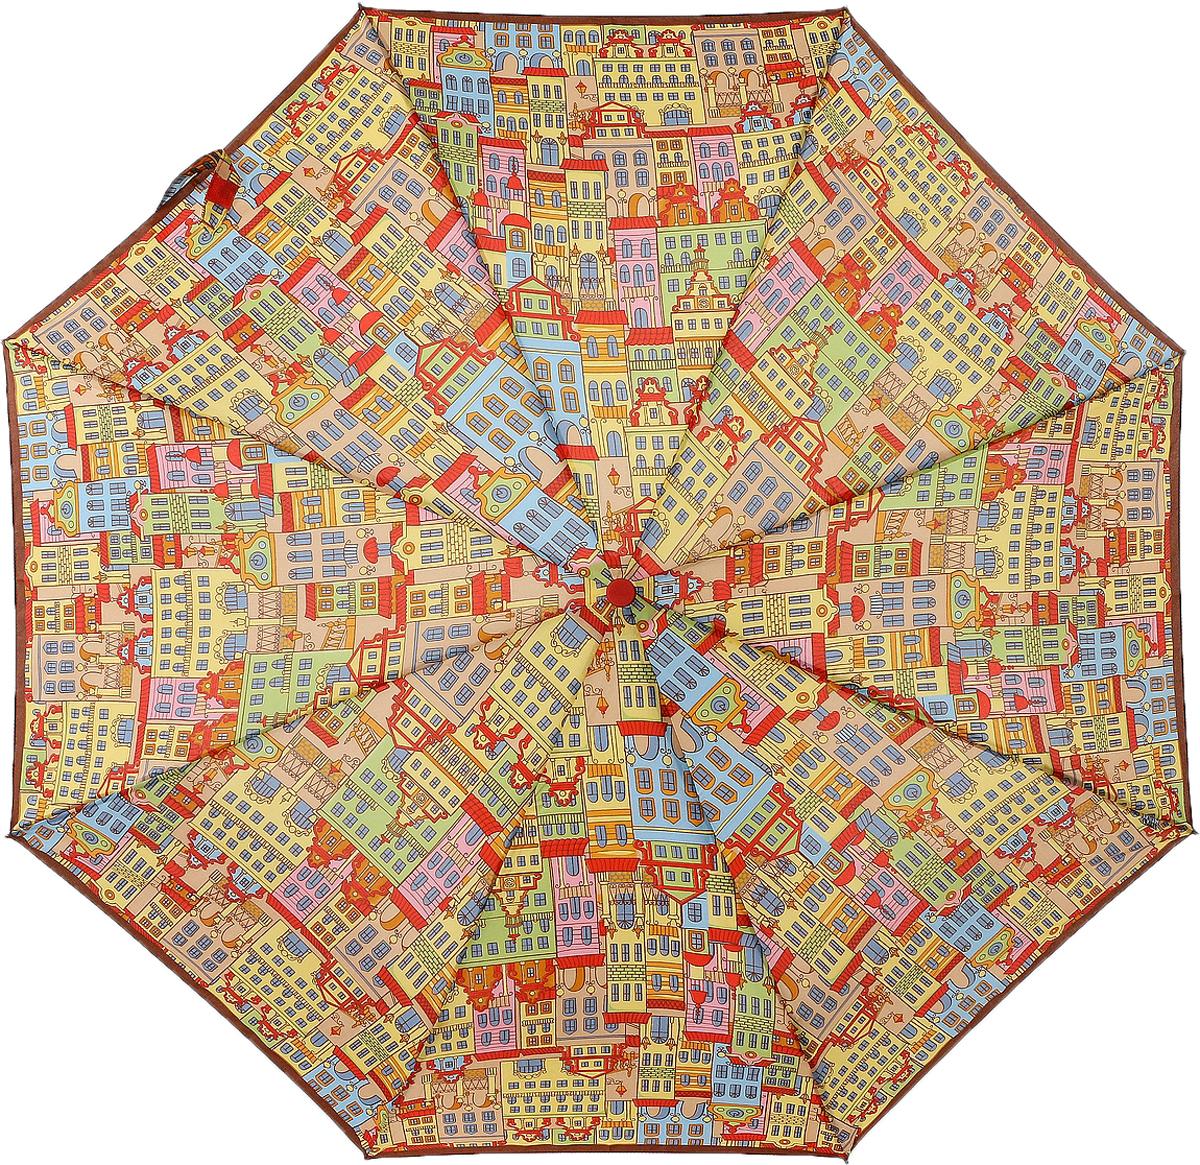 Зонт женский Airton, автомат, 3 сложения, цвет: желтый, красный, голубой. 3915s-121 зонт airton 3917 8028 полный автомат женский